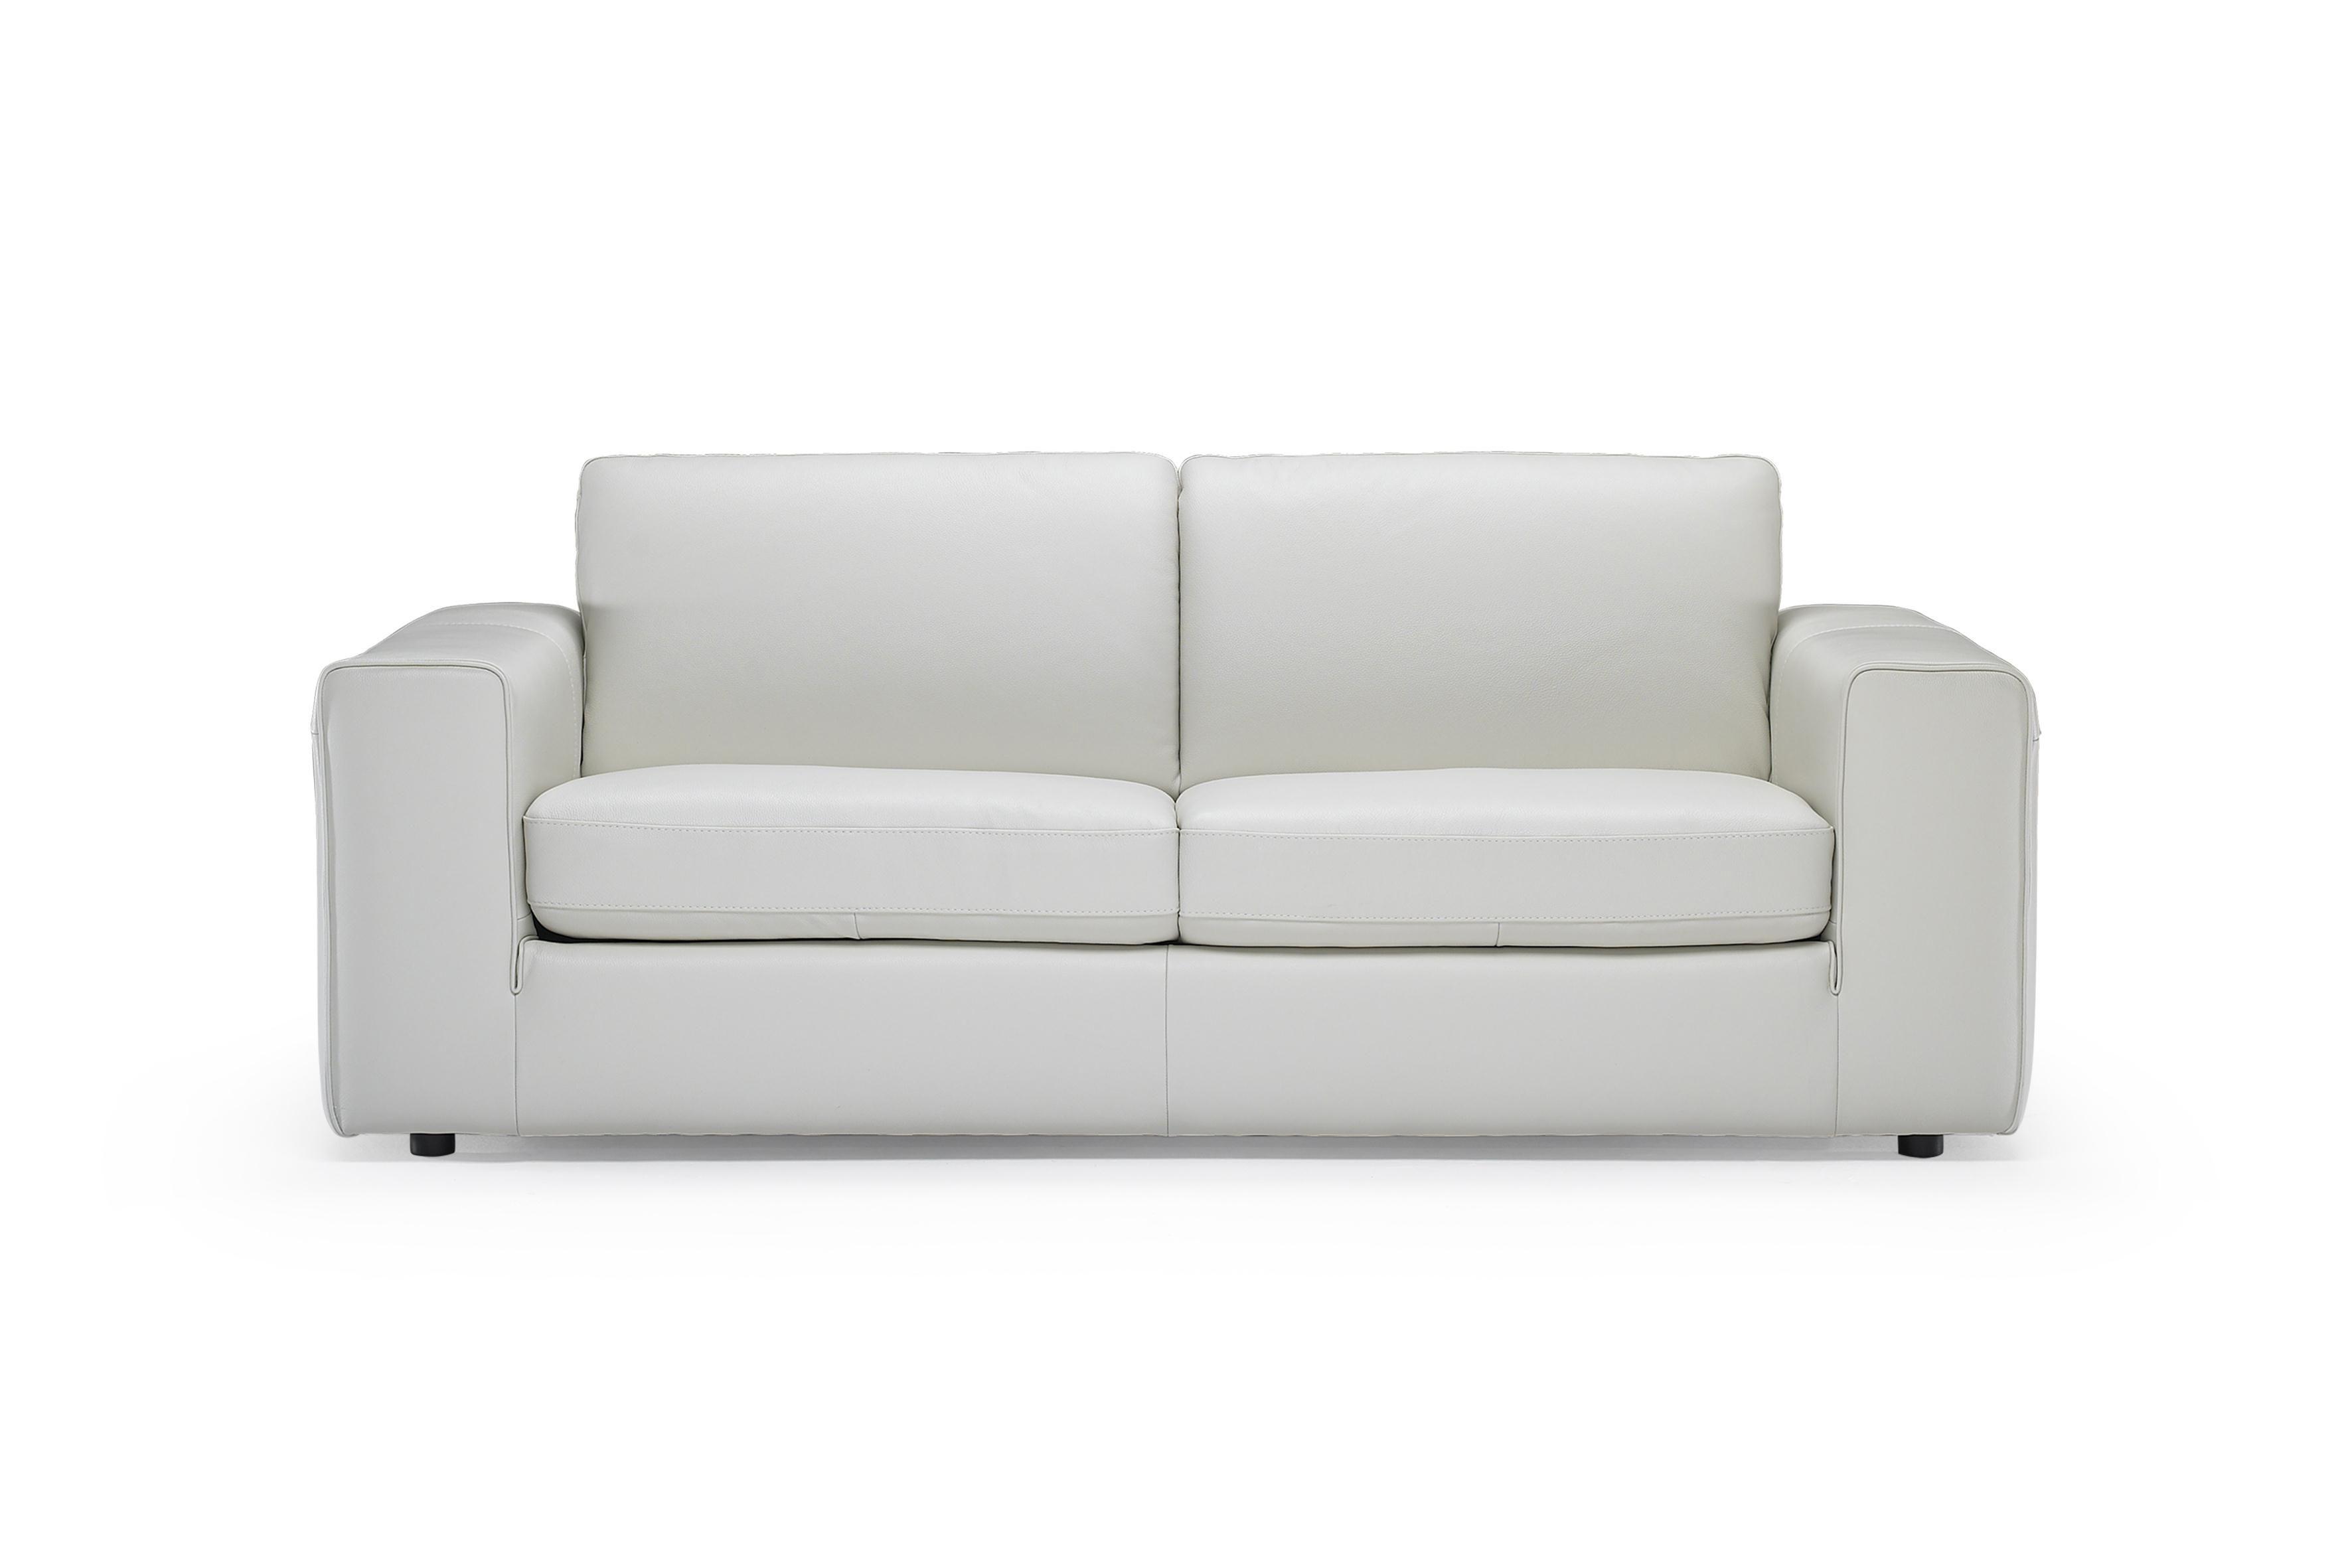 Dado Sofa Bed by Natuzzi Italia | Natuzzi Italia | Luxury ...